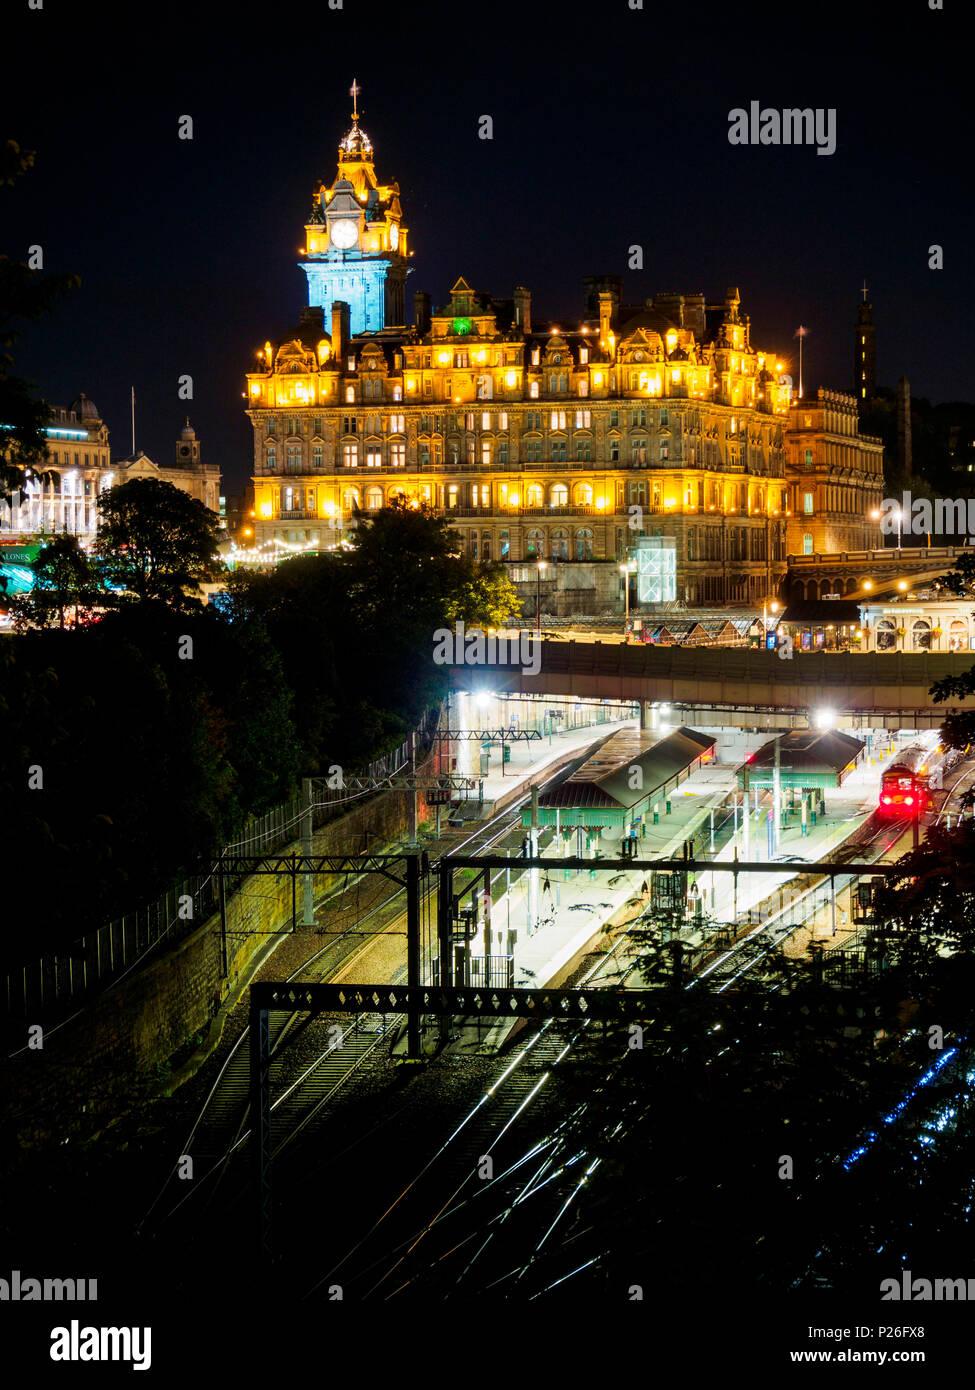 Waverley railway station, Edinburgh, Scotland, Great Britain, Europe Stock Photo